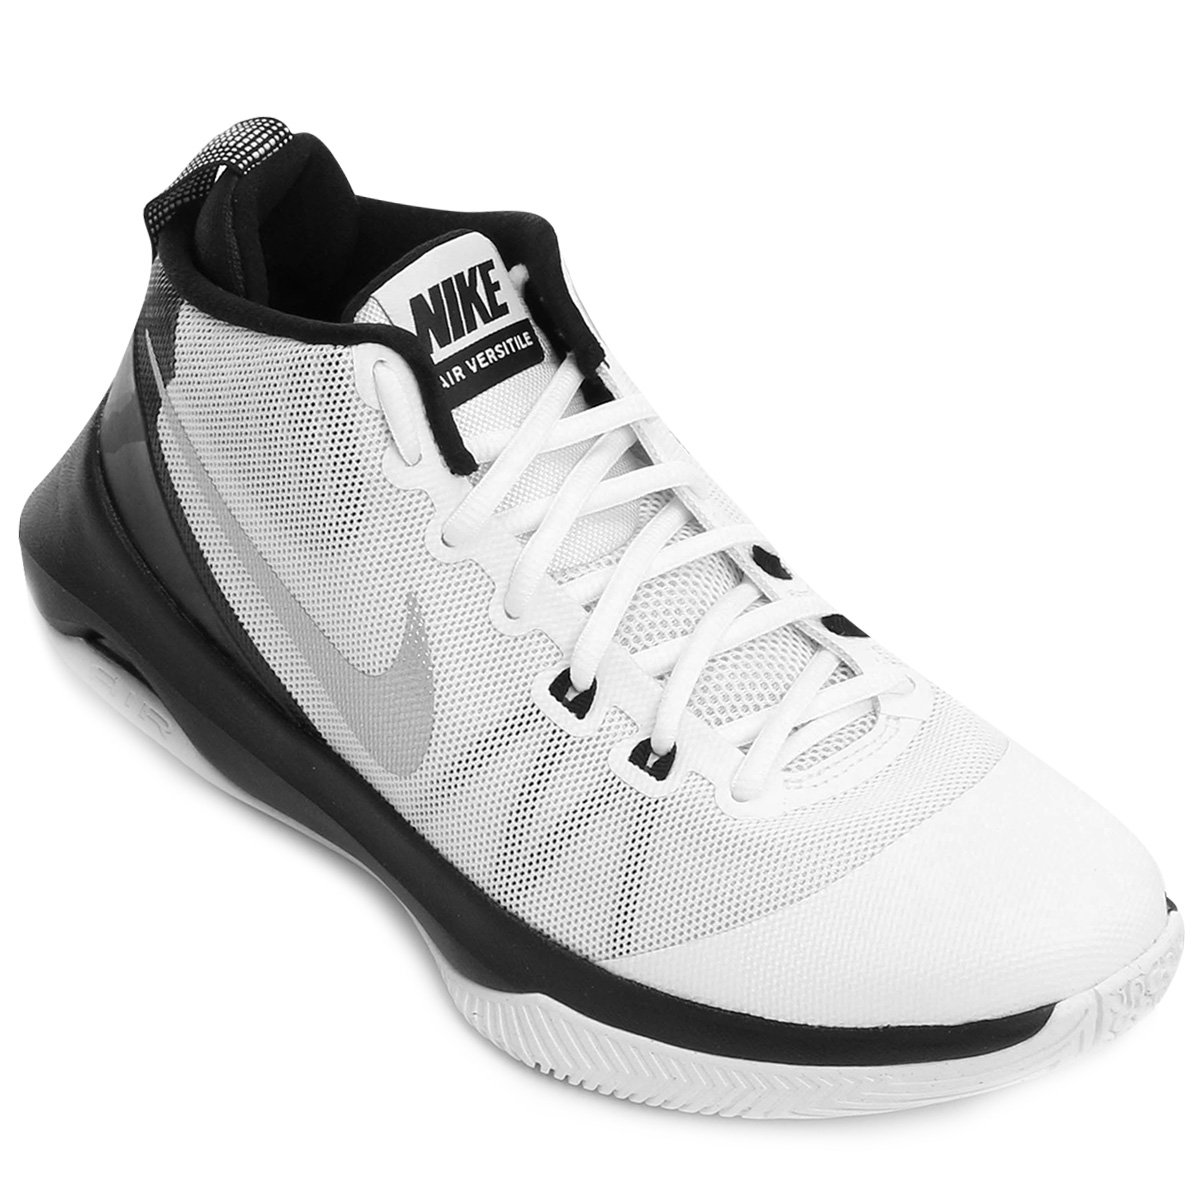 ac609214b1 Tênis Nike Air Versitile Masculino - Branco e Preto - Compre Agora ...